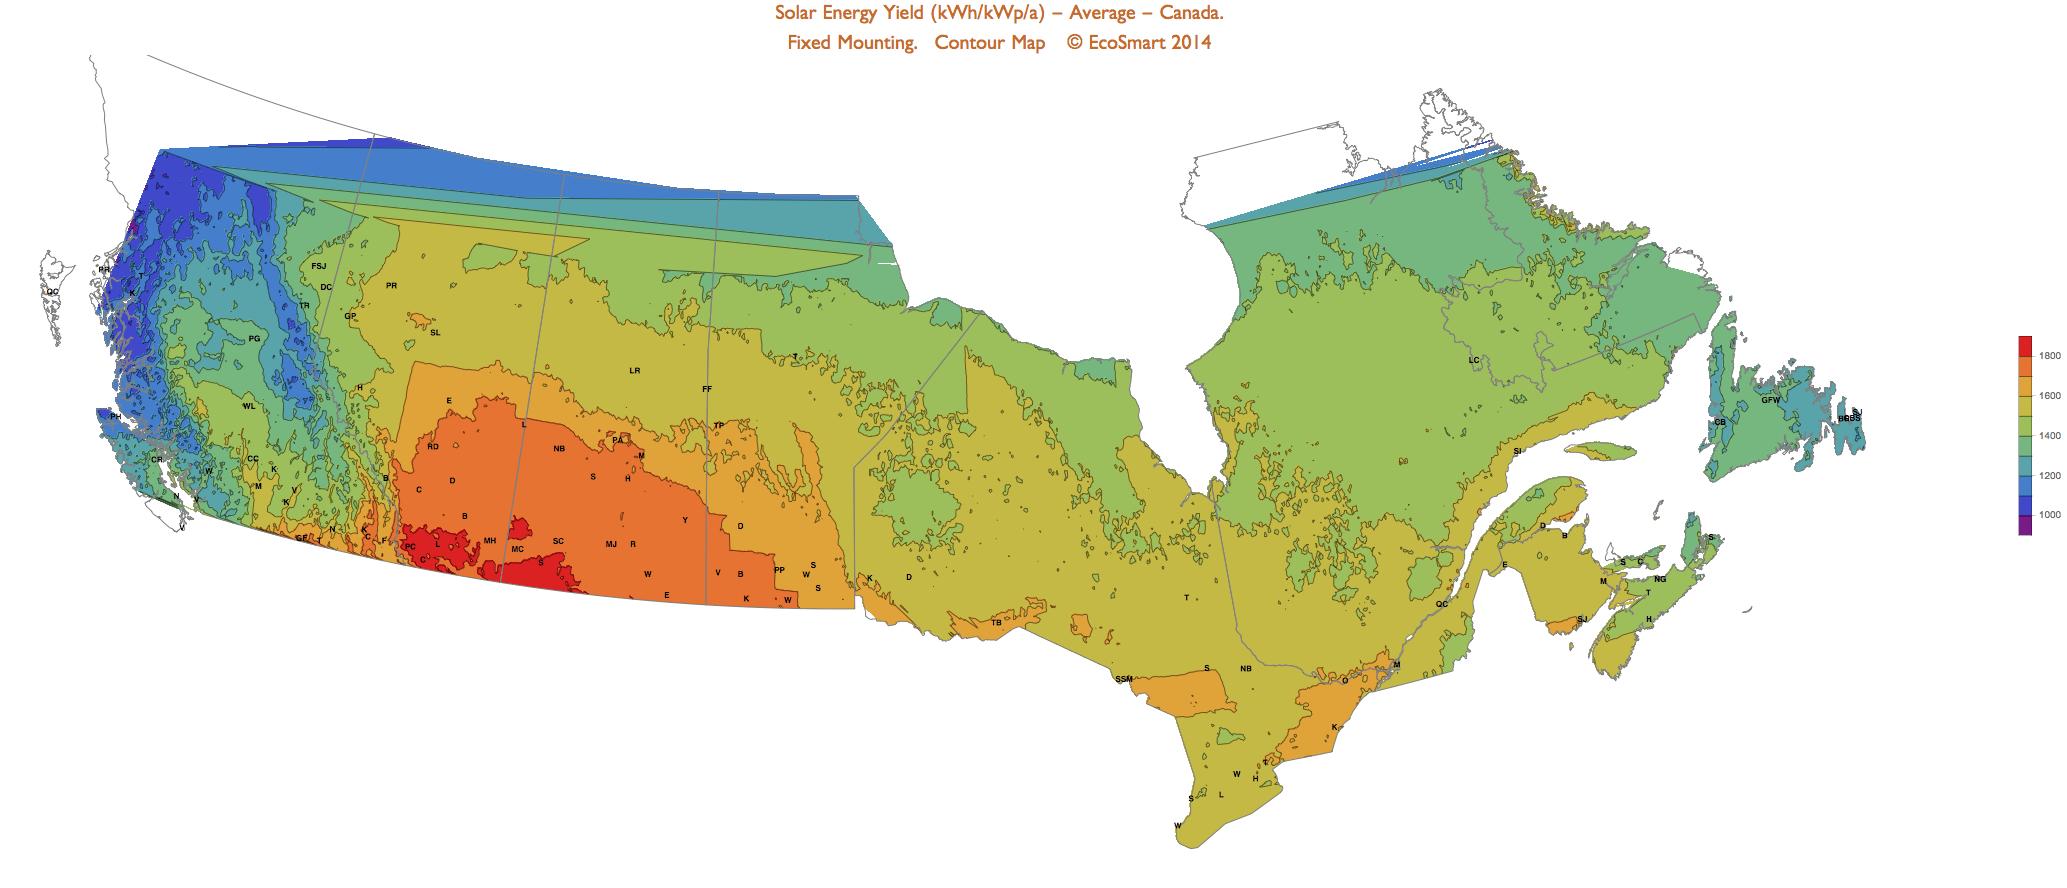 Solar Resources Canada Map - Annual Average Irradiation